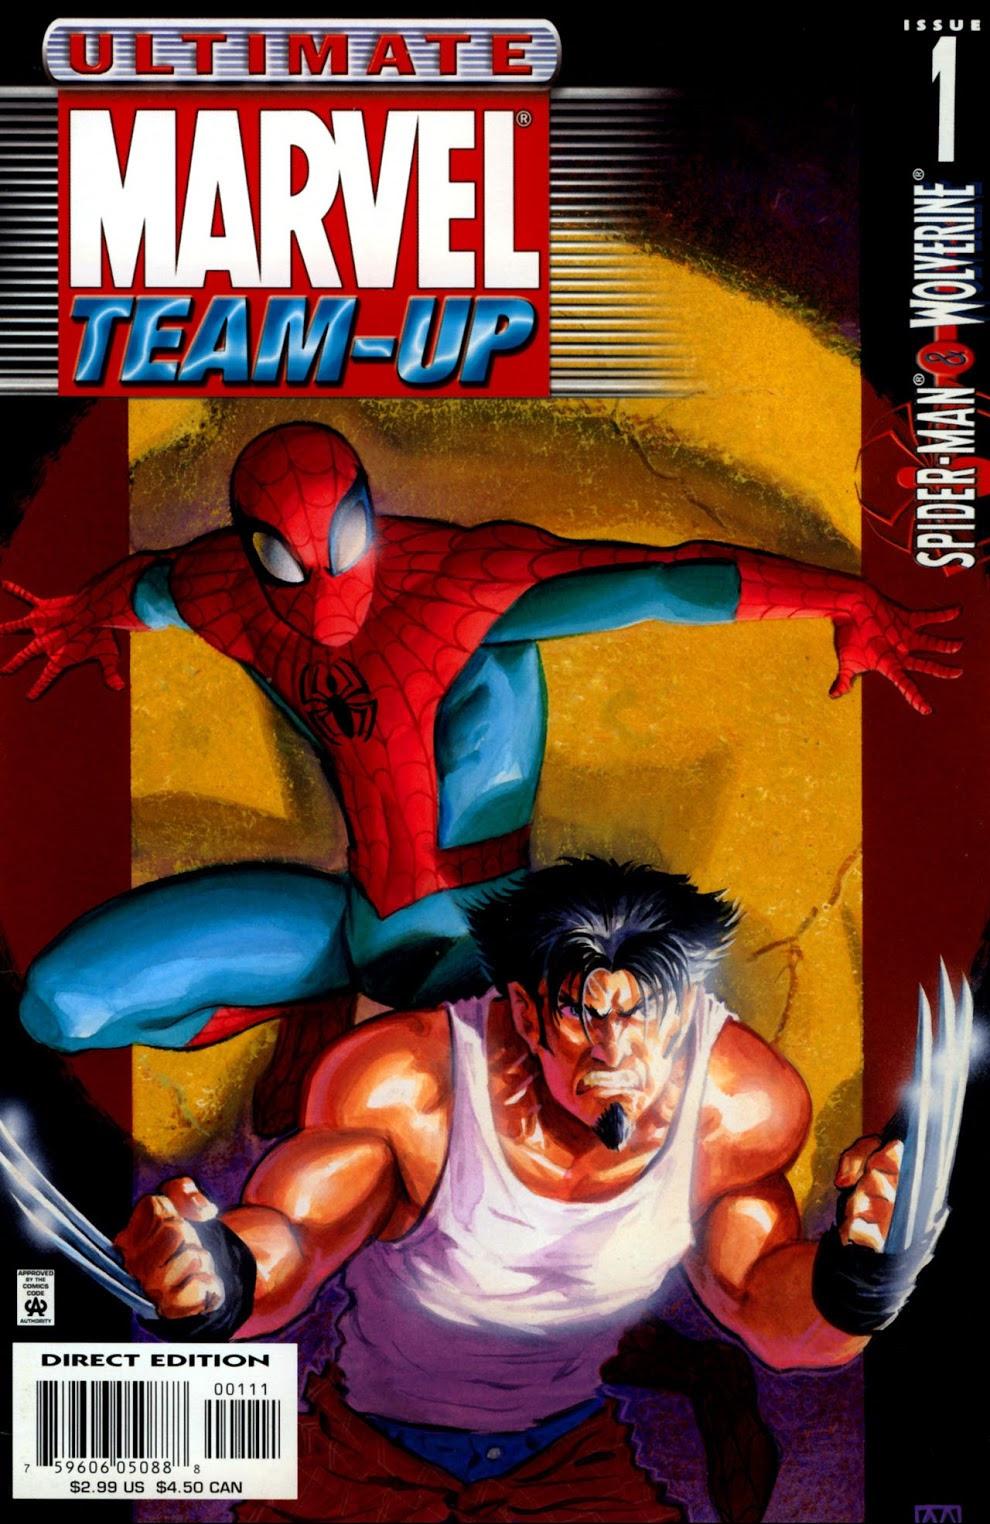 Ultimate Marvel Grandes Encontros Vol 1 1